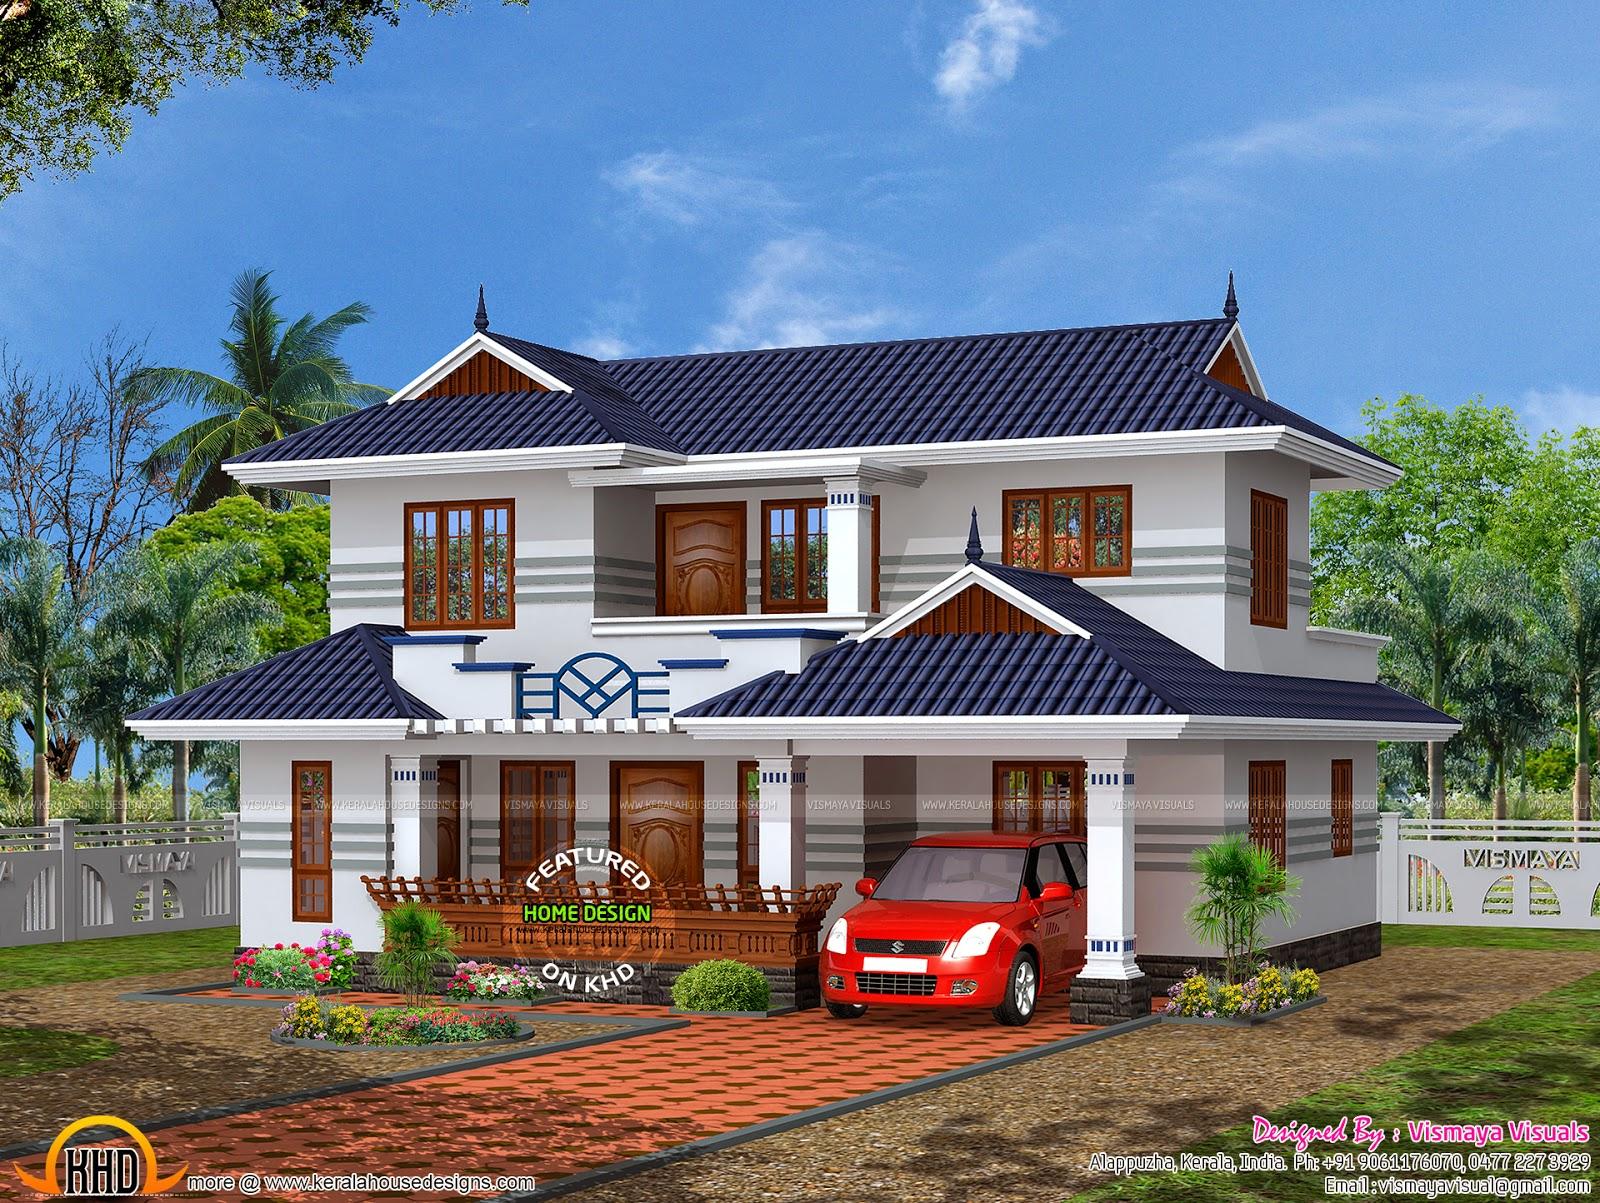 typical kerala house plan kerala home design and floor plans. Black Bedroom Furniture Sets. Home Design Ideas